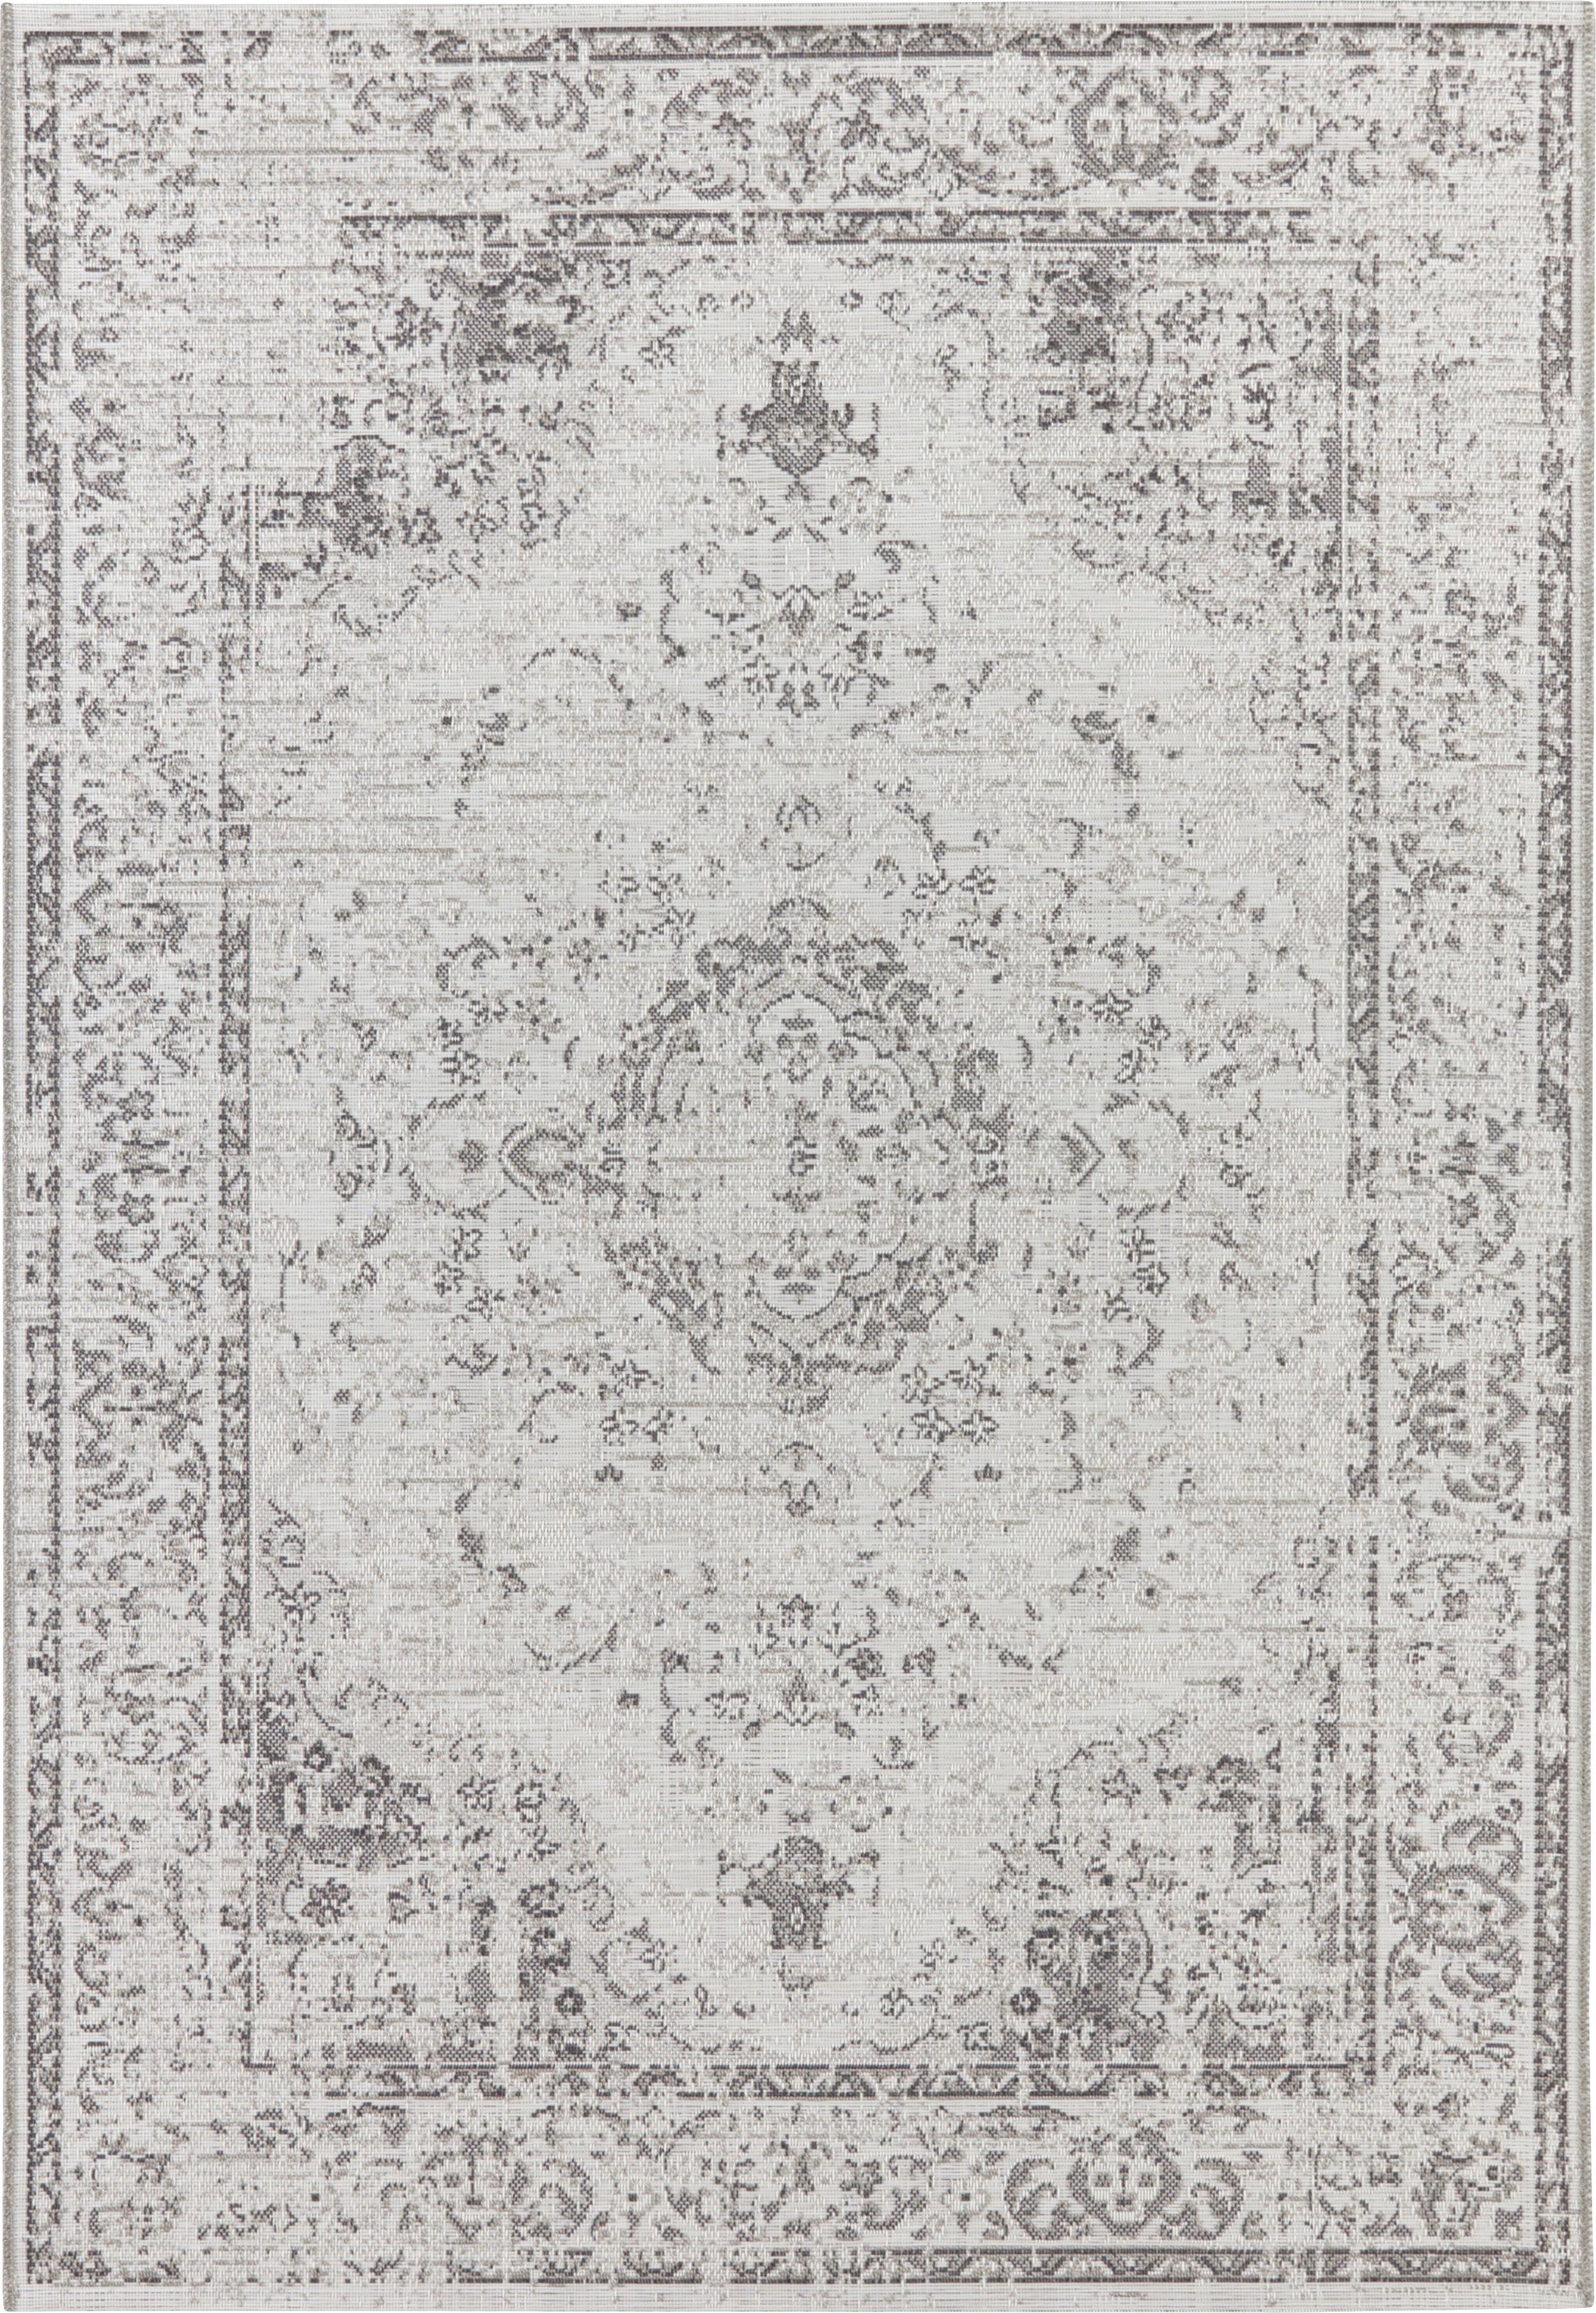 Alfombra de interior y exterior Cenon, Polipropileno, Crema, gris, An 190 x L 290 cm (Tamaño L)